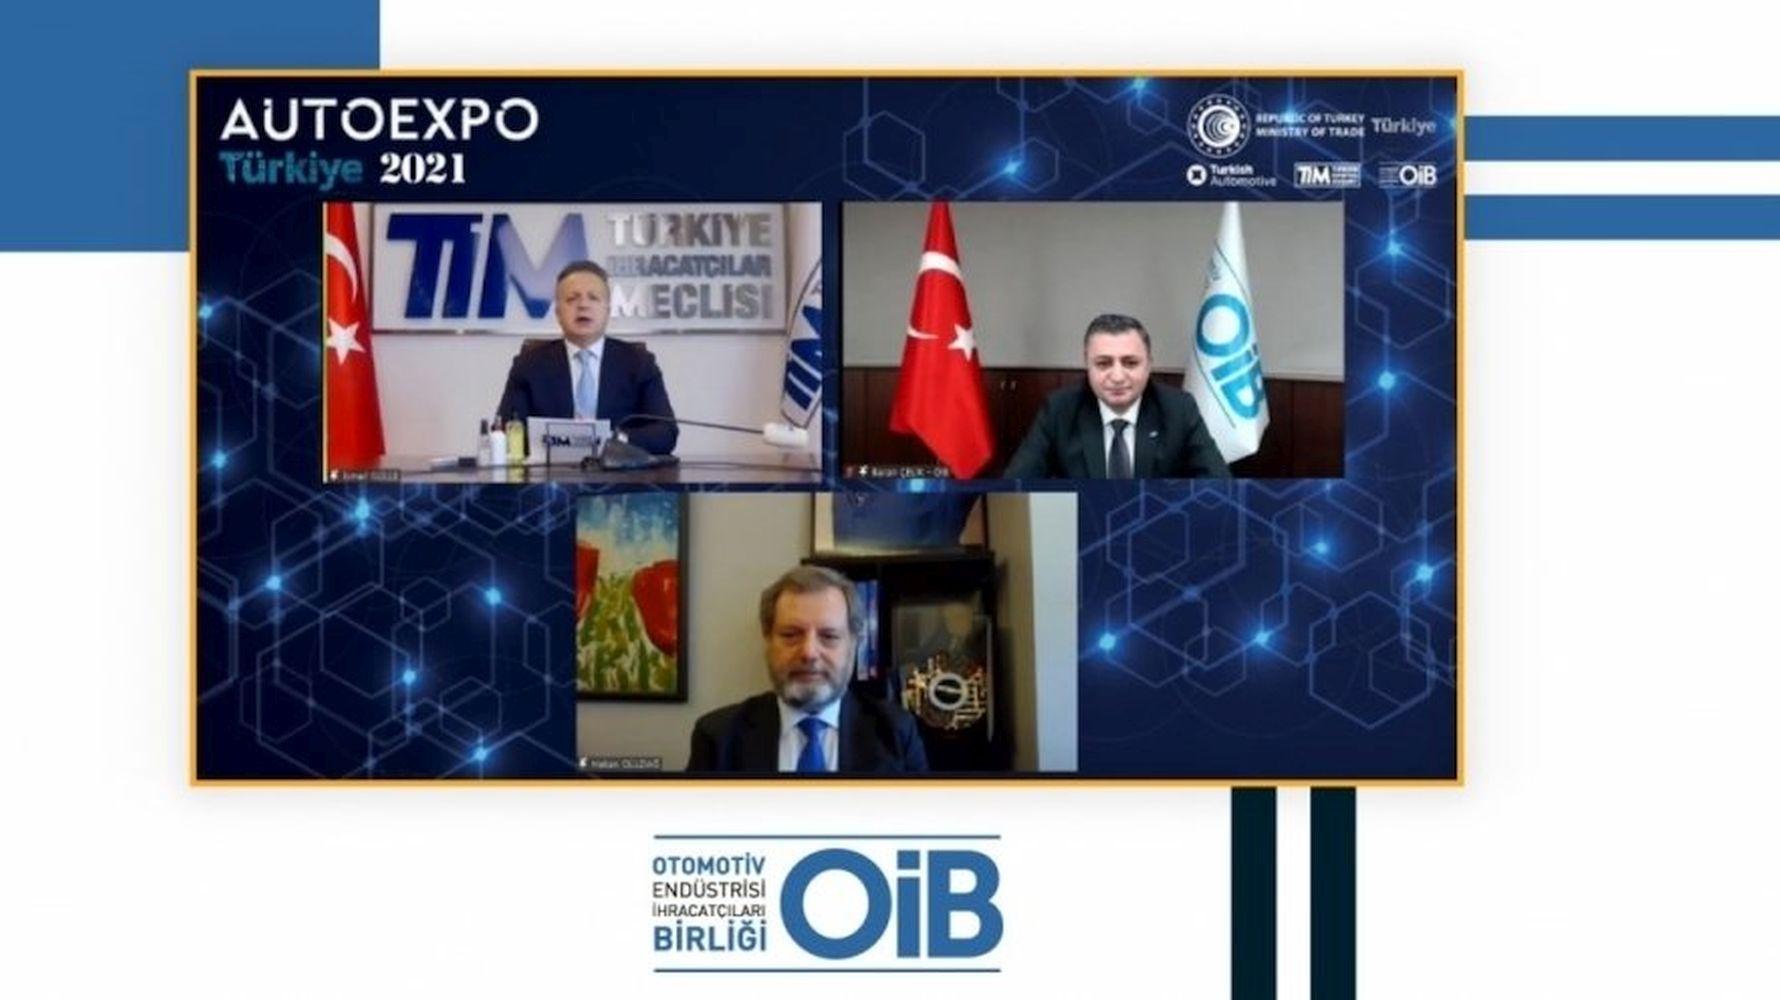 we will increase exports with celik auto expo, president of bursa oib